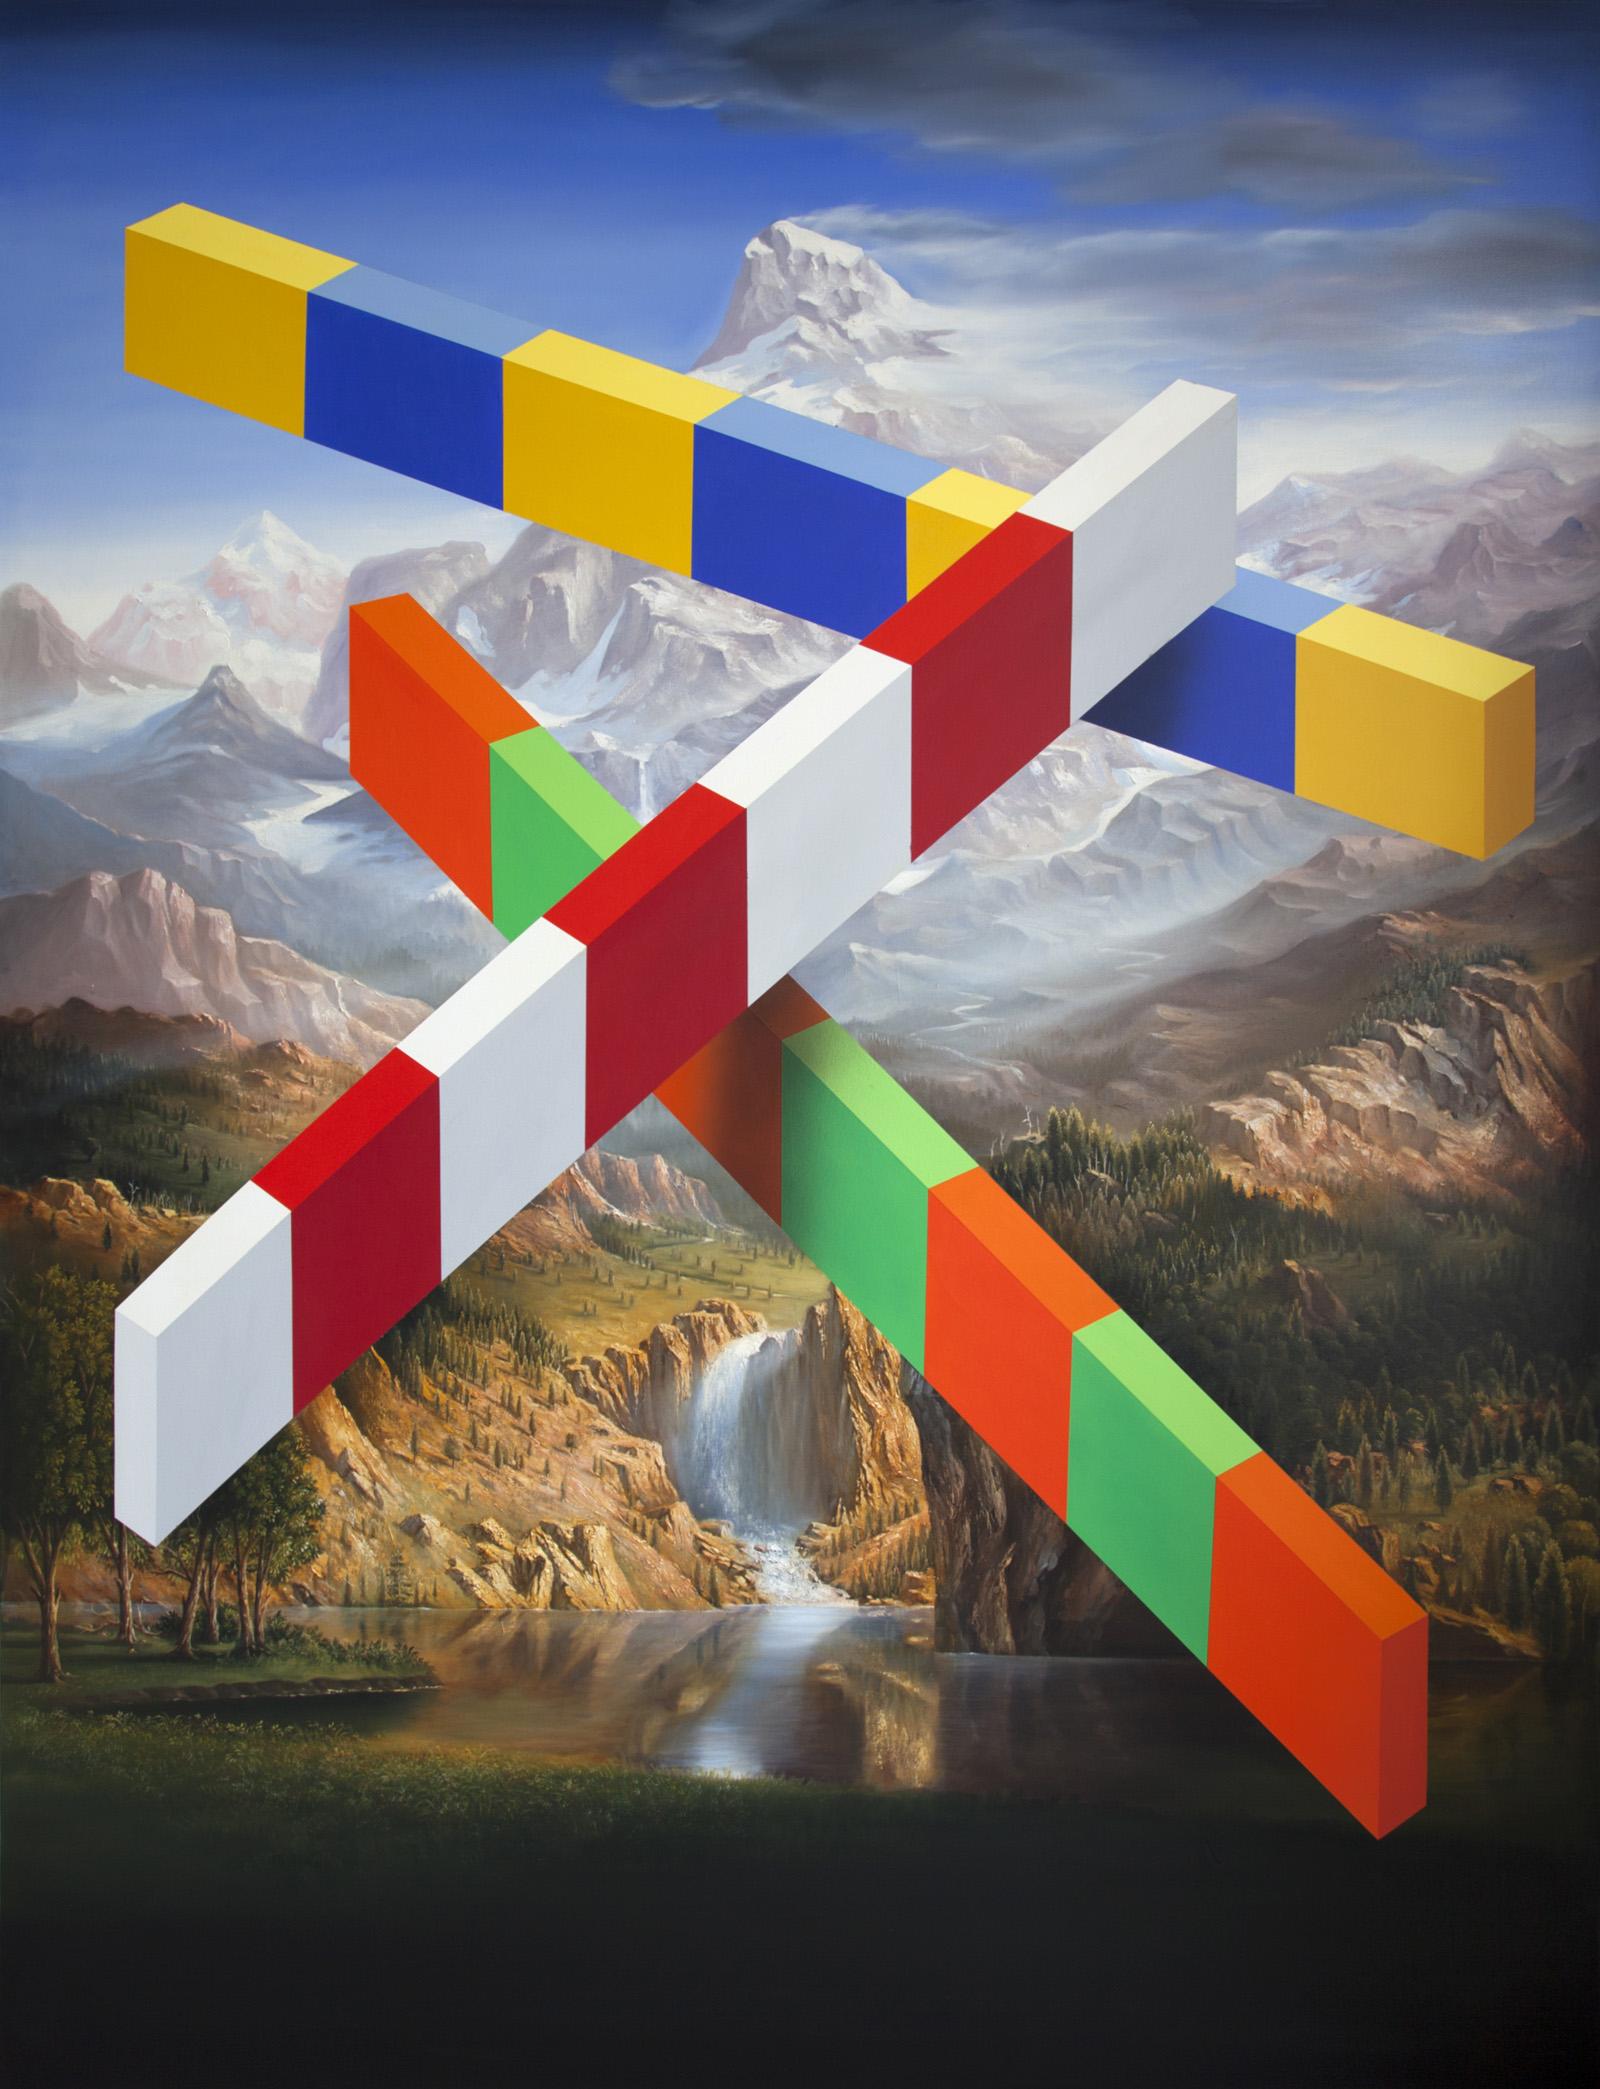 PETER DAVERINGTON   The Bowery  2018 Oil and acrylic on canvas 260 x 198 cm